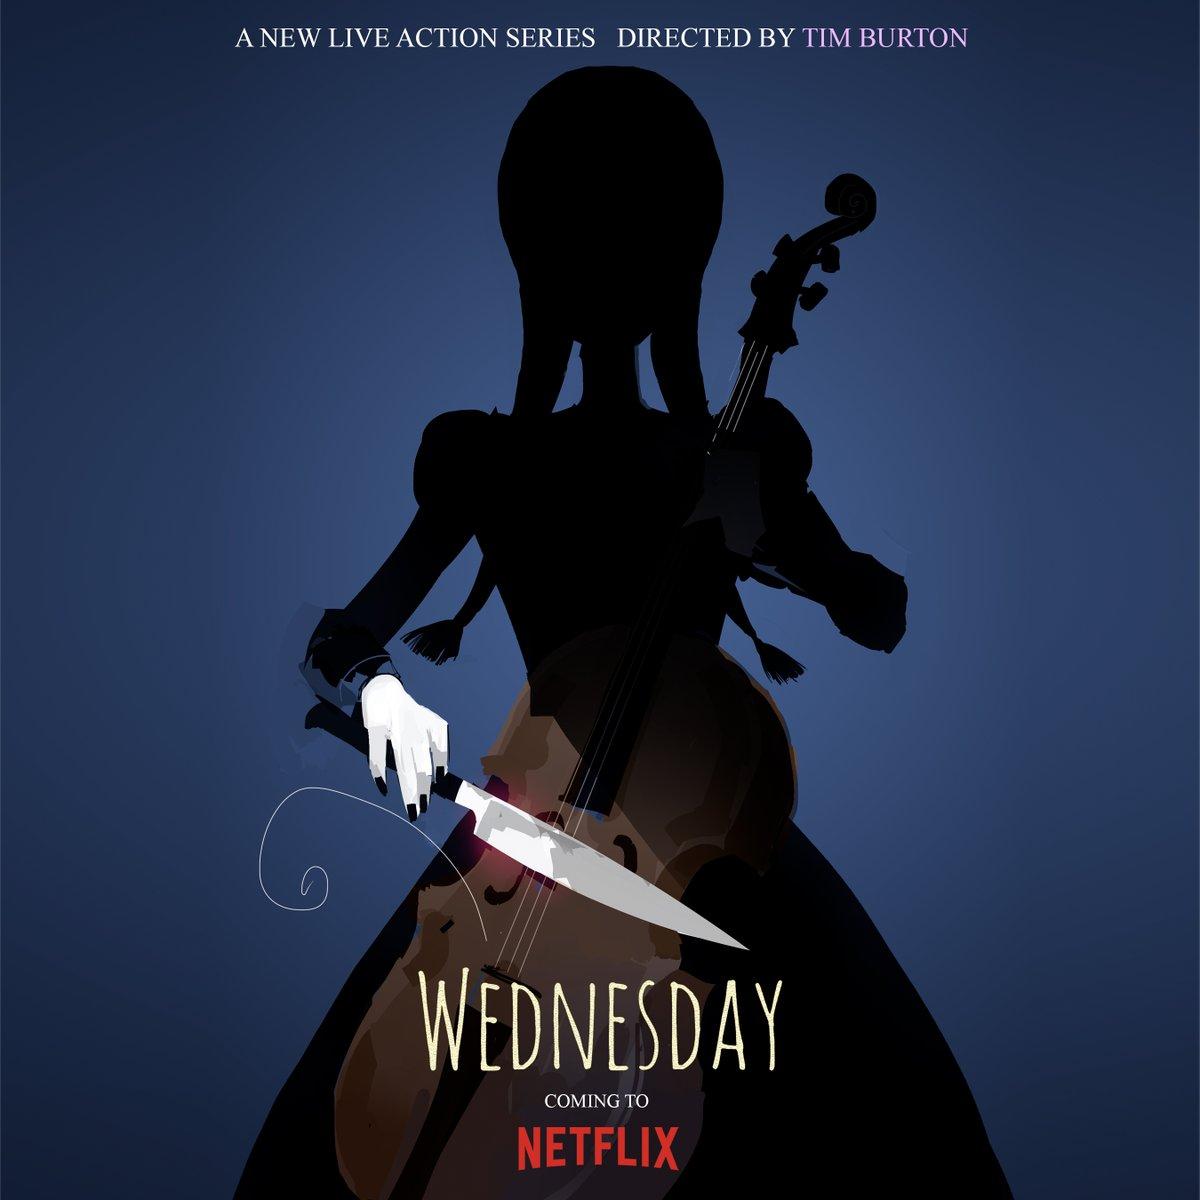 Wednesday Netflix by Tim Burton